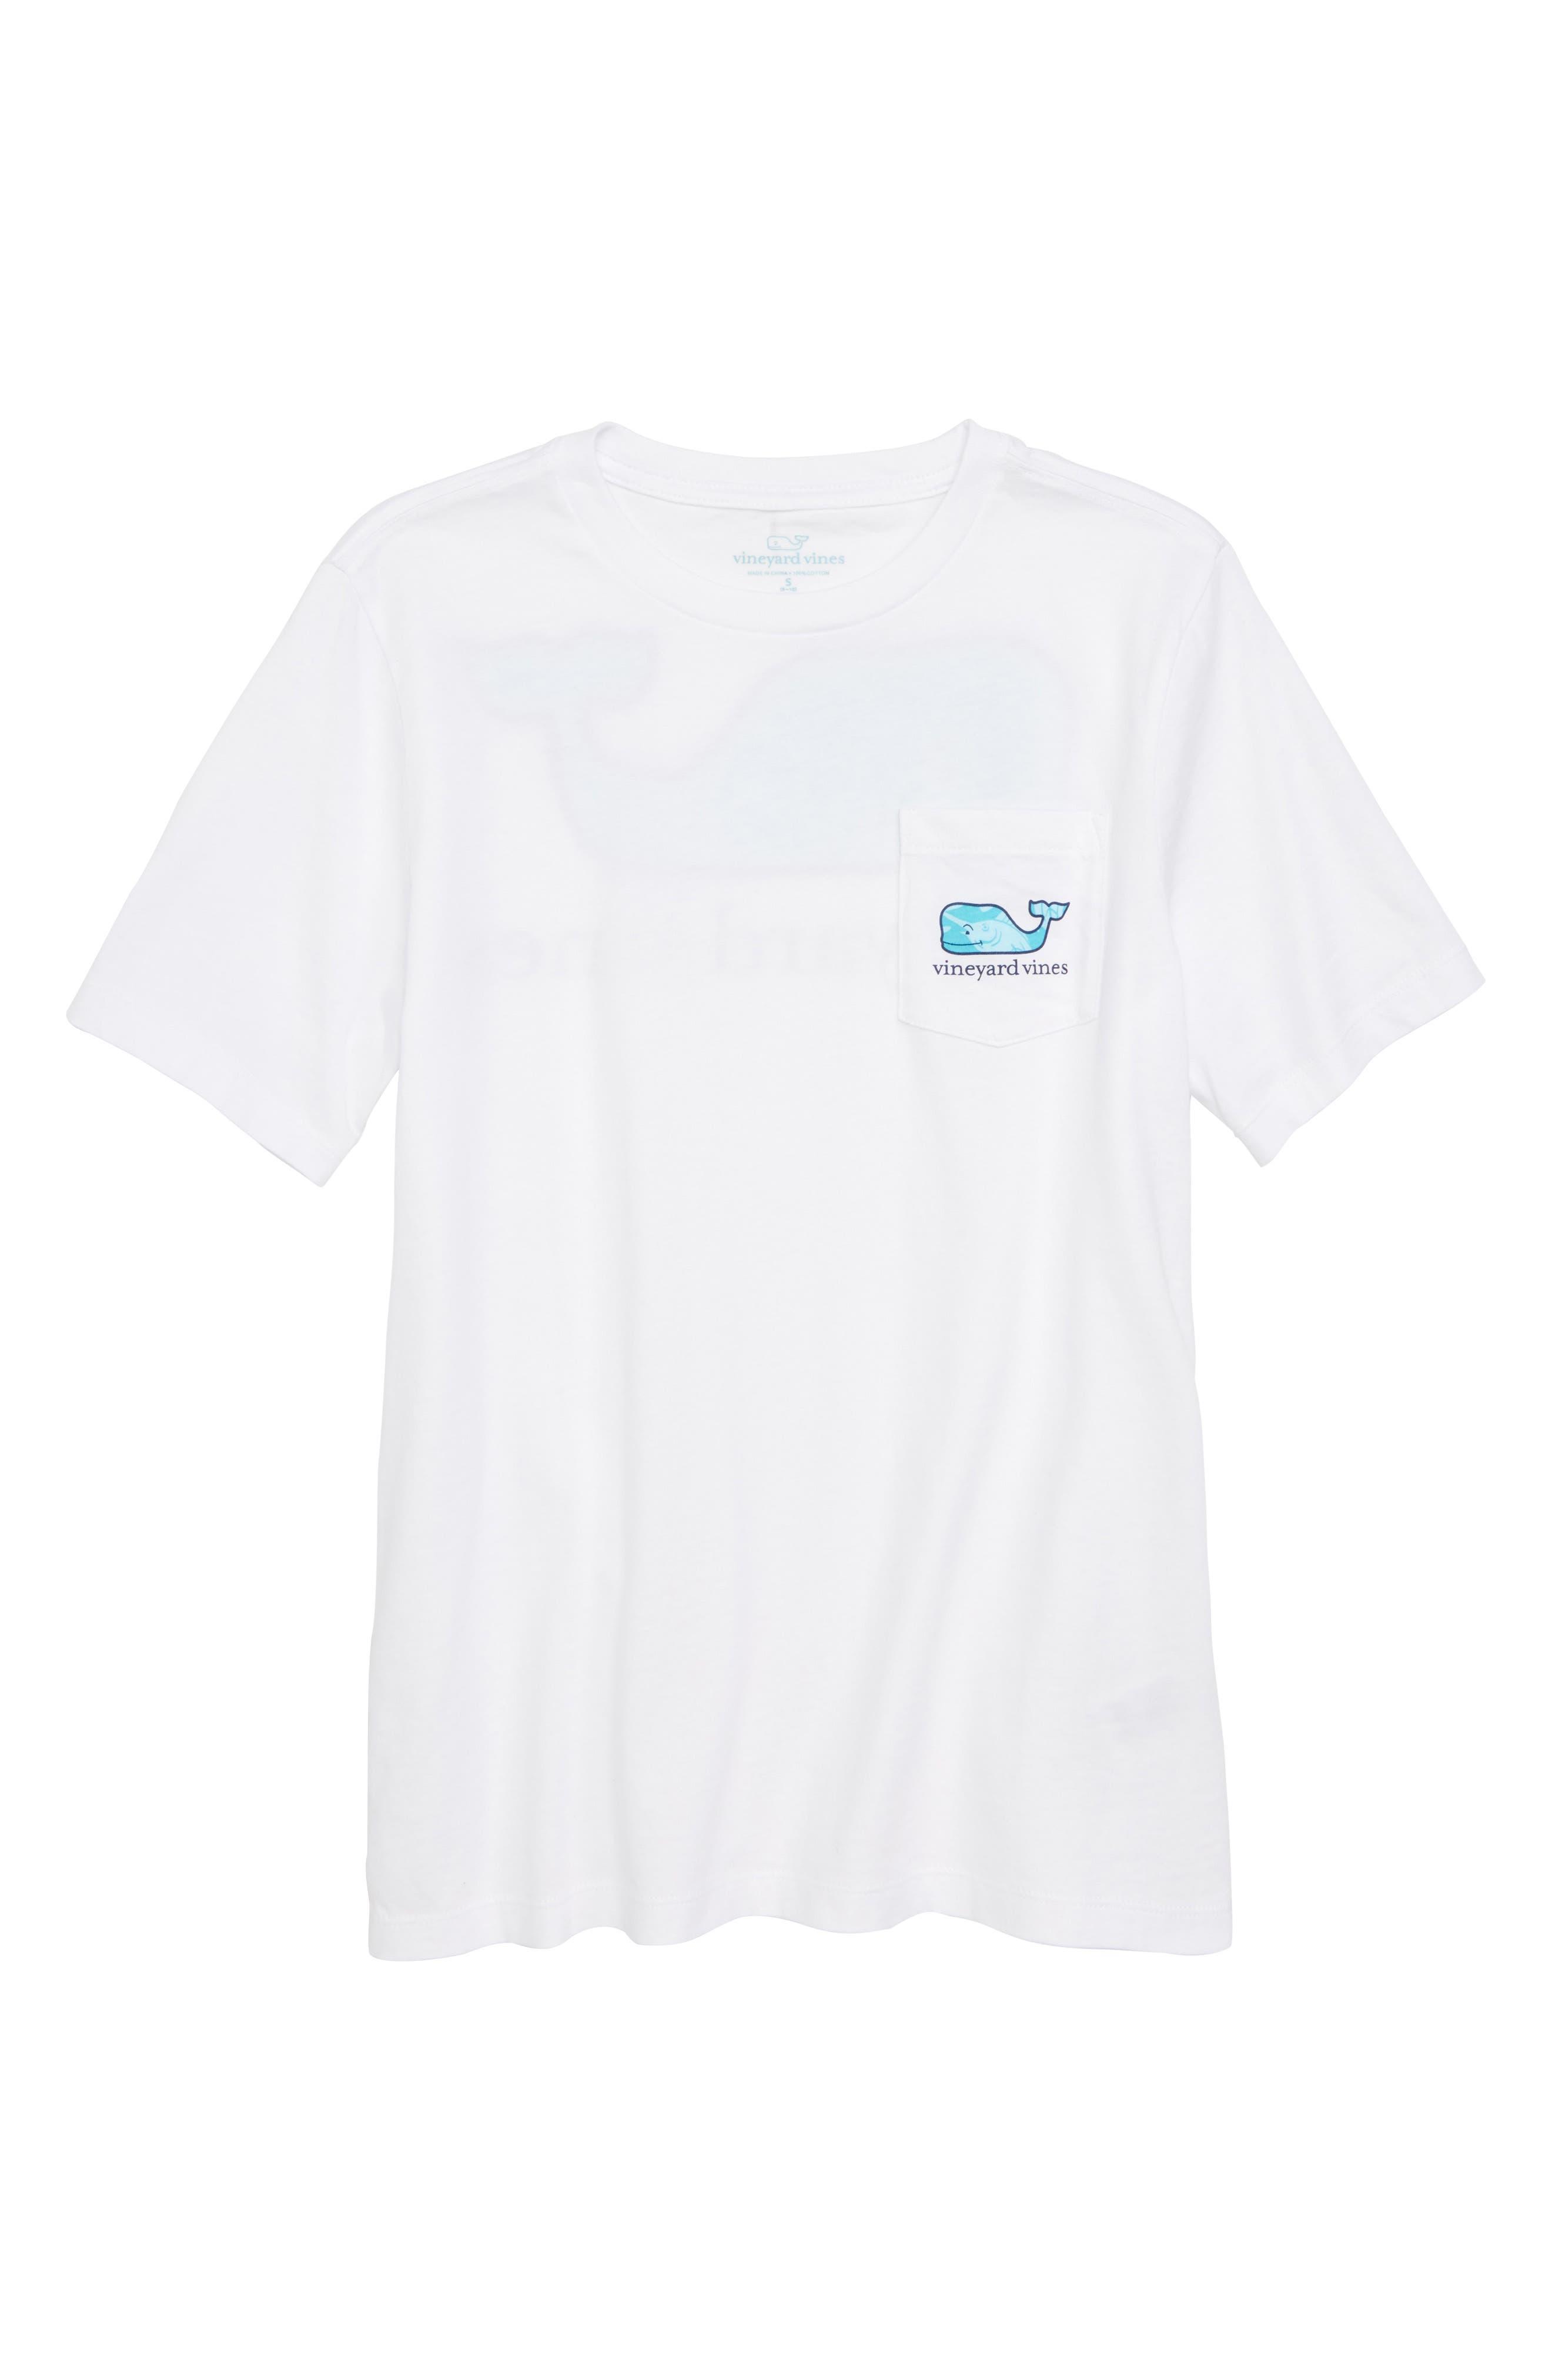 Main Image - vineyard vines Marlin Whale Pocket T-Shirt (Toddler Boys & Little Boys)